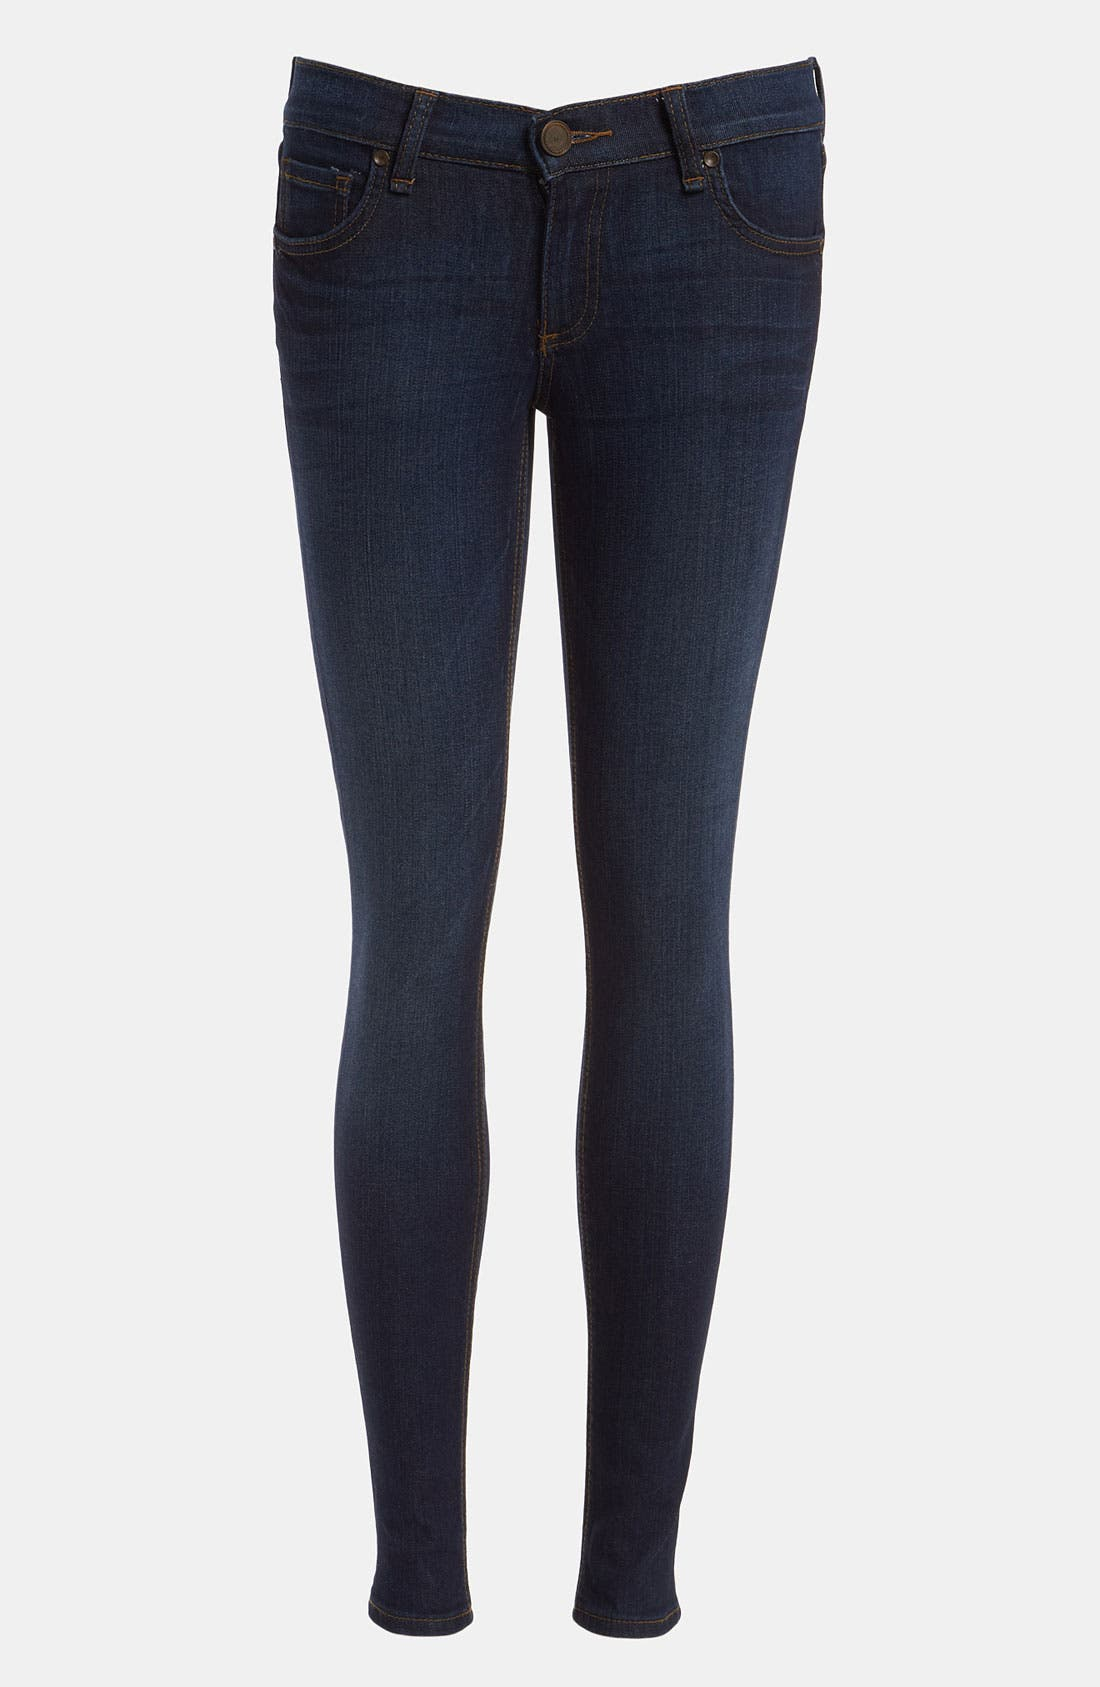 Main Image - edyson 'Sloan' Skinny Jeans (Dark Atlantic)